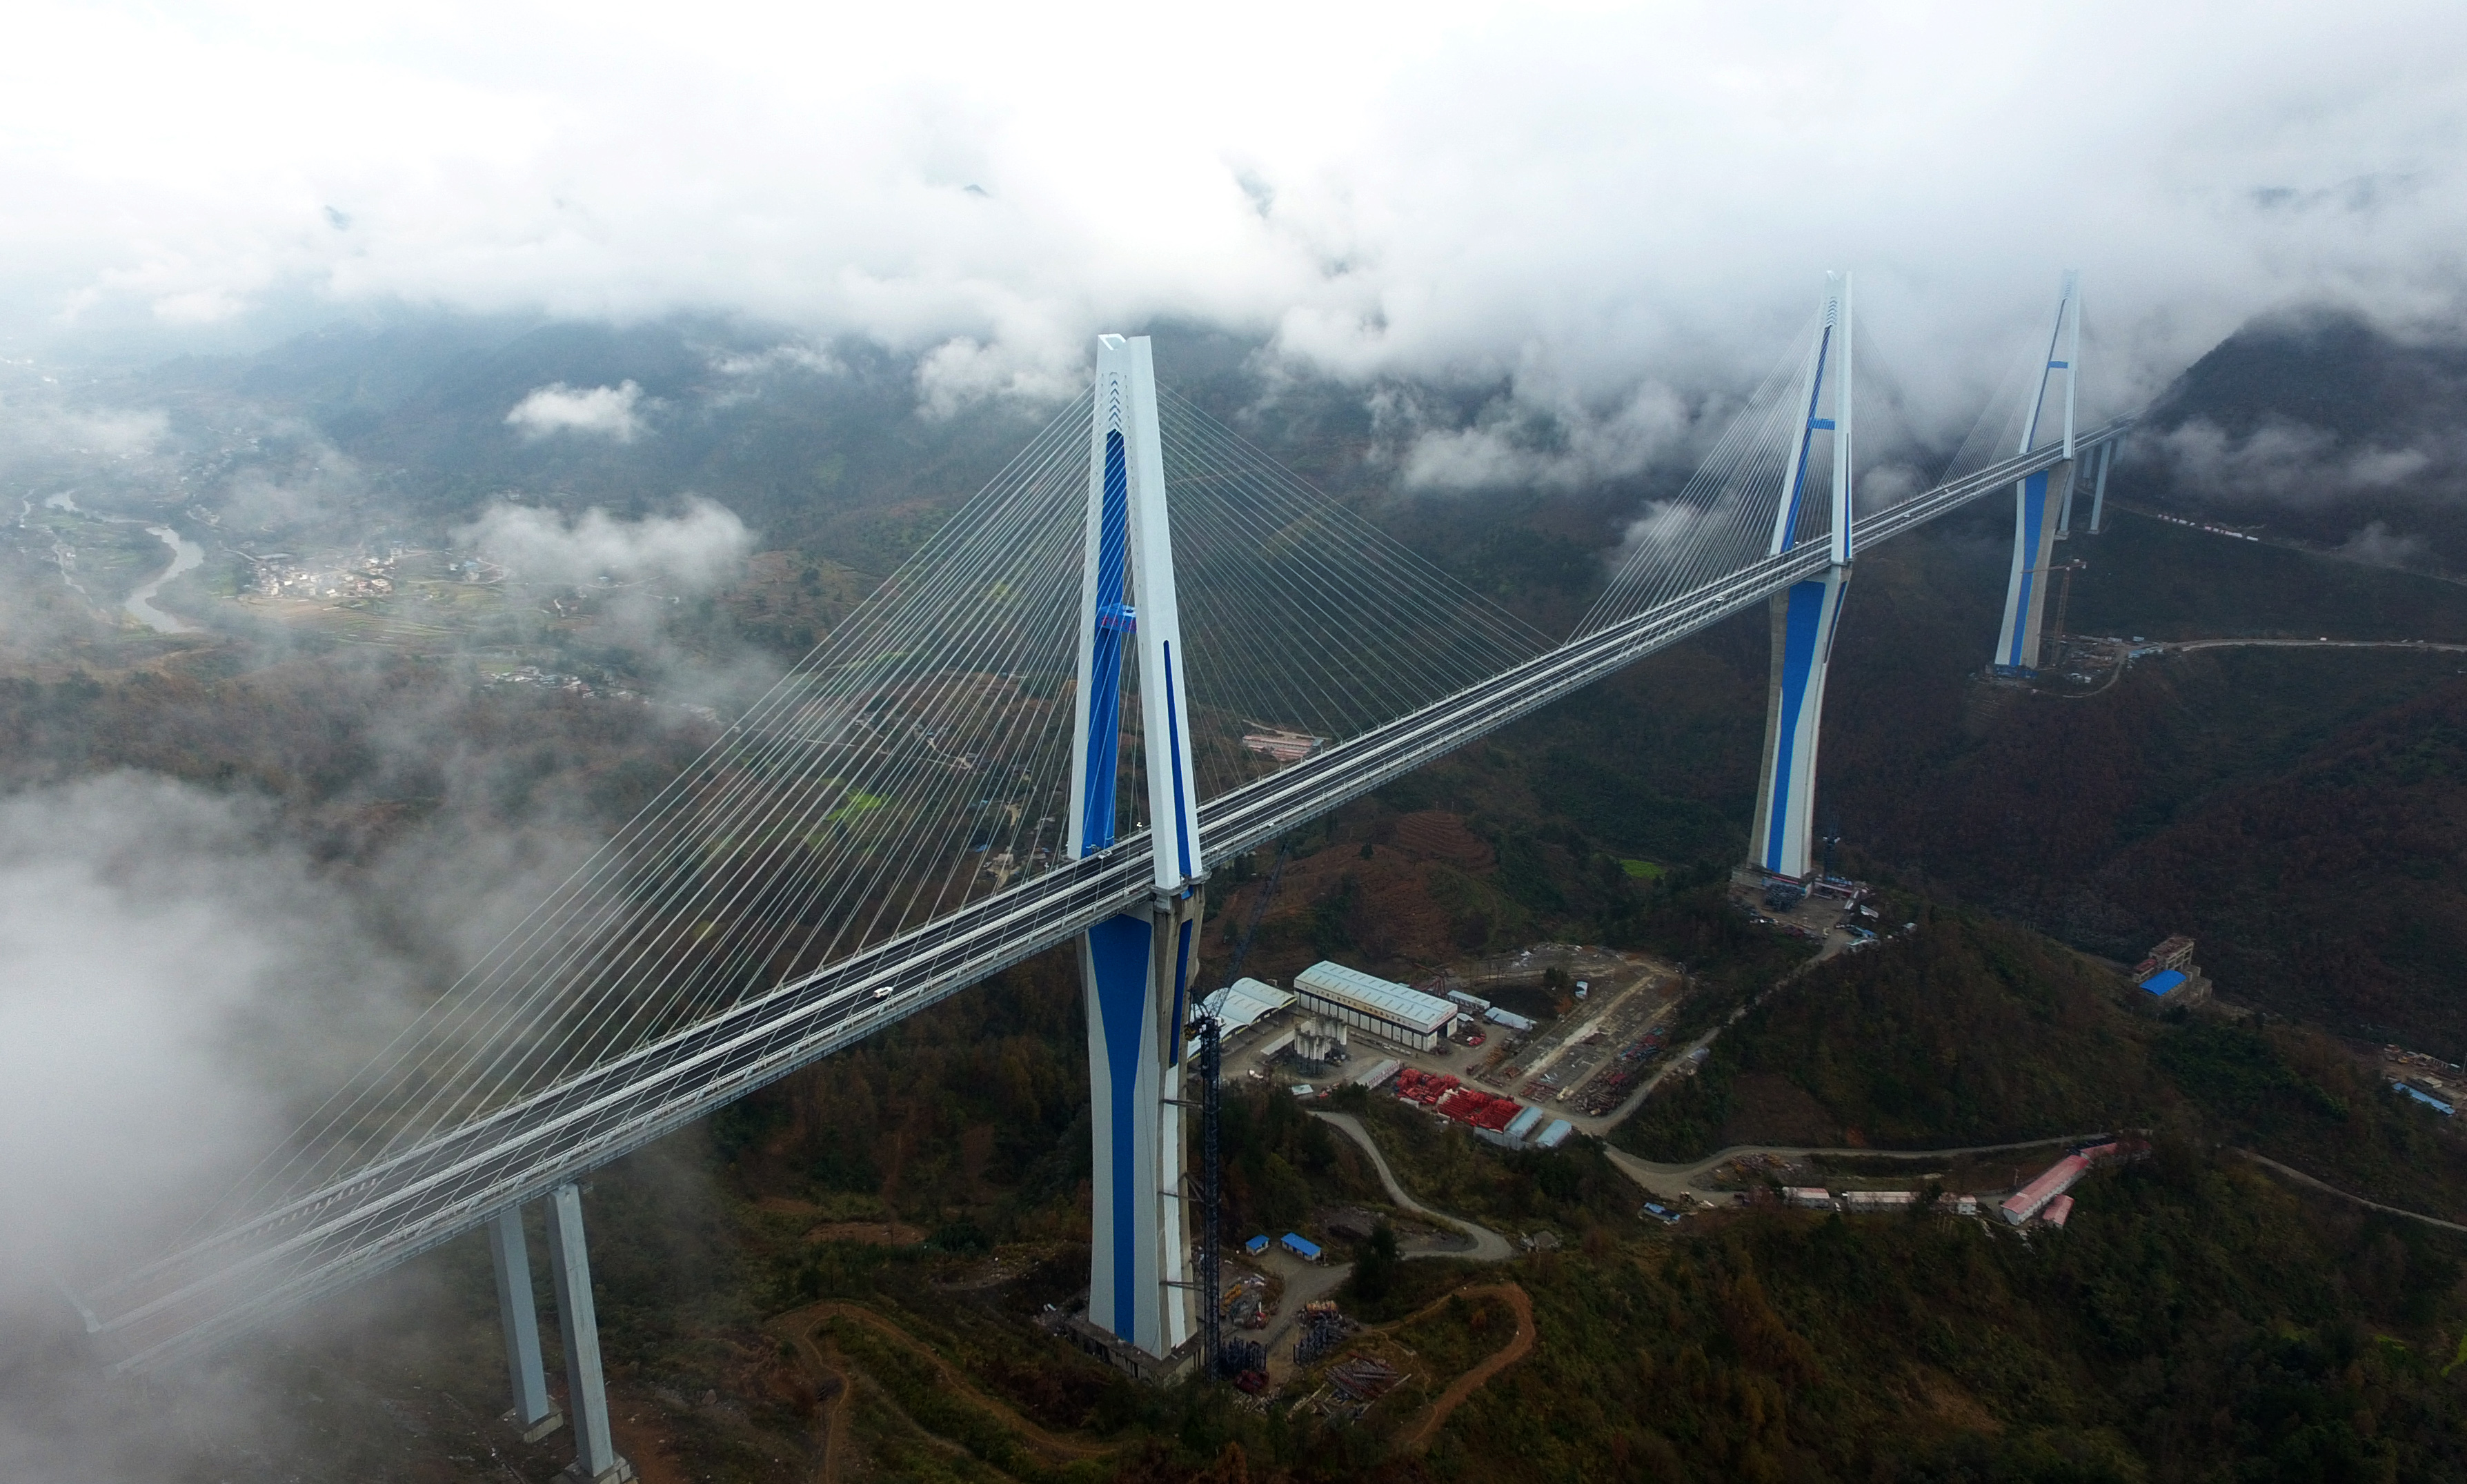 中国・貴州省の平塘特大橋が正式開通、全長2135m